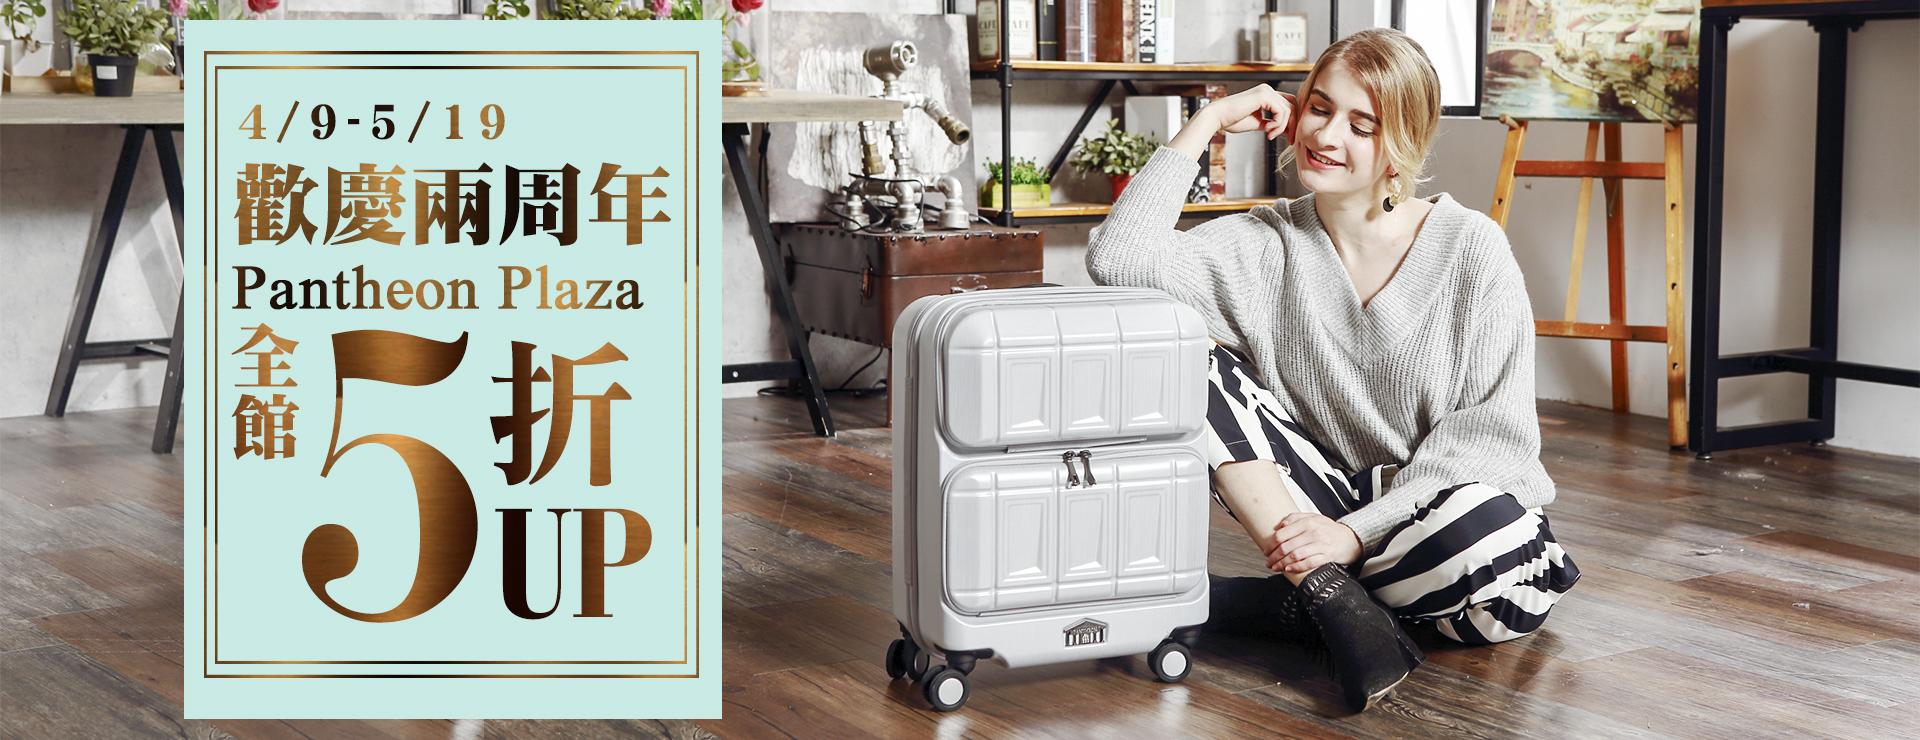 PantheonPlaza,luggage,周年慶,五折優惠,前開式行李箱,旅行箱,精品行李箱,熱銷款,推薦款,出遊首選